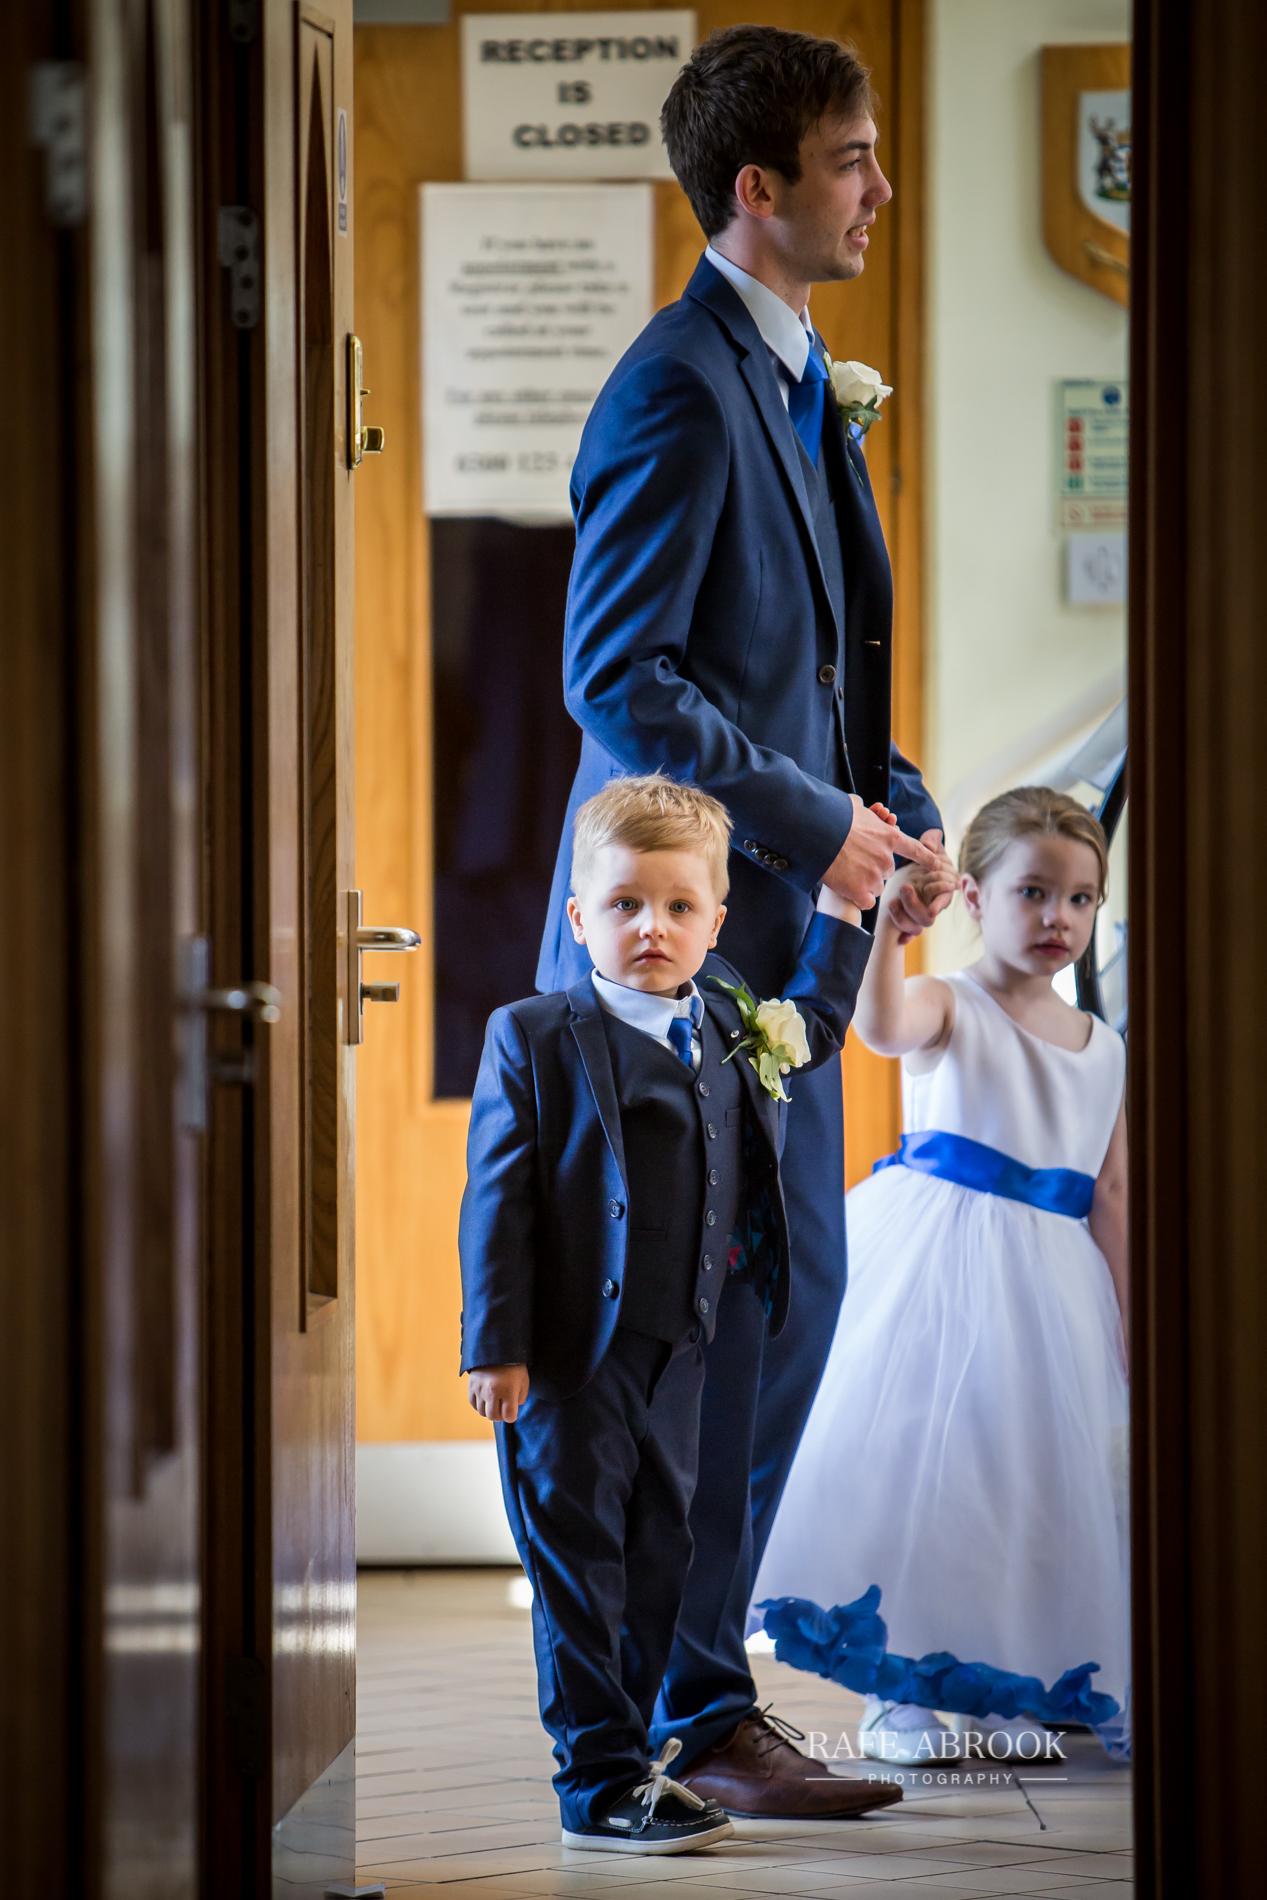 agnes & laurence wedding kings lodge hotel kings langley hertfordshire-1092.jpg